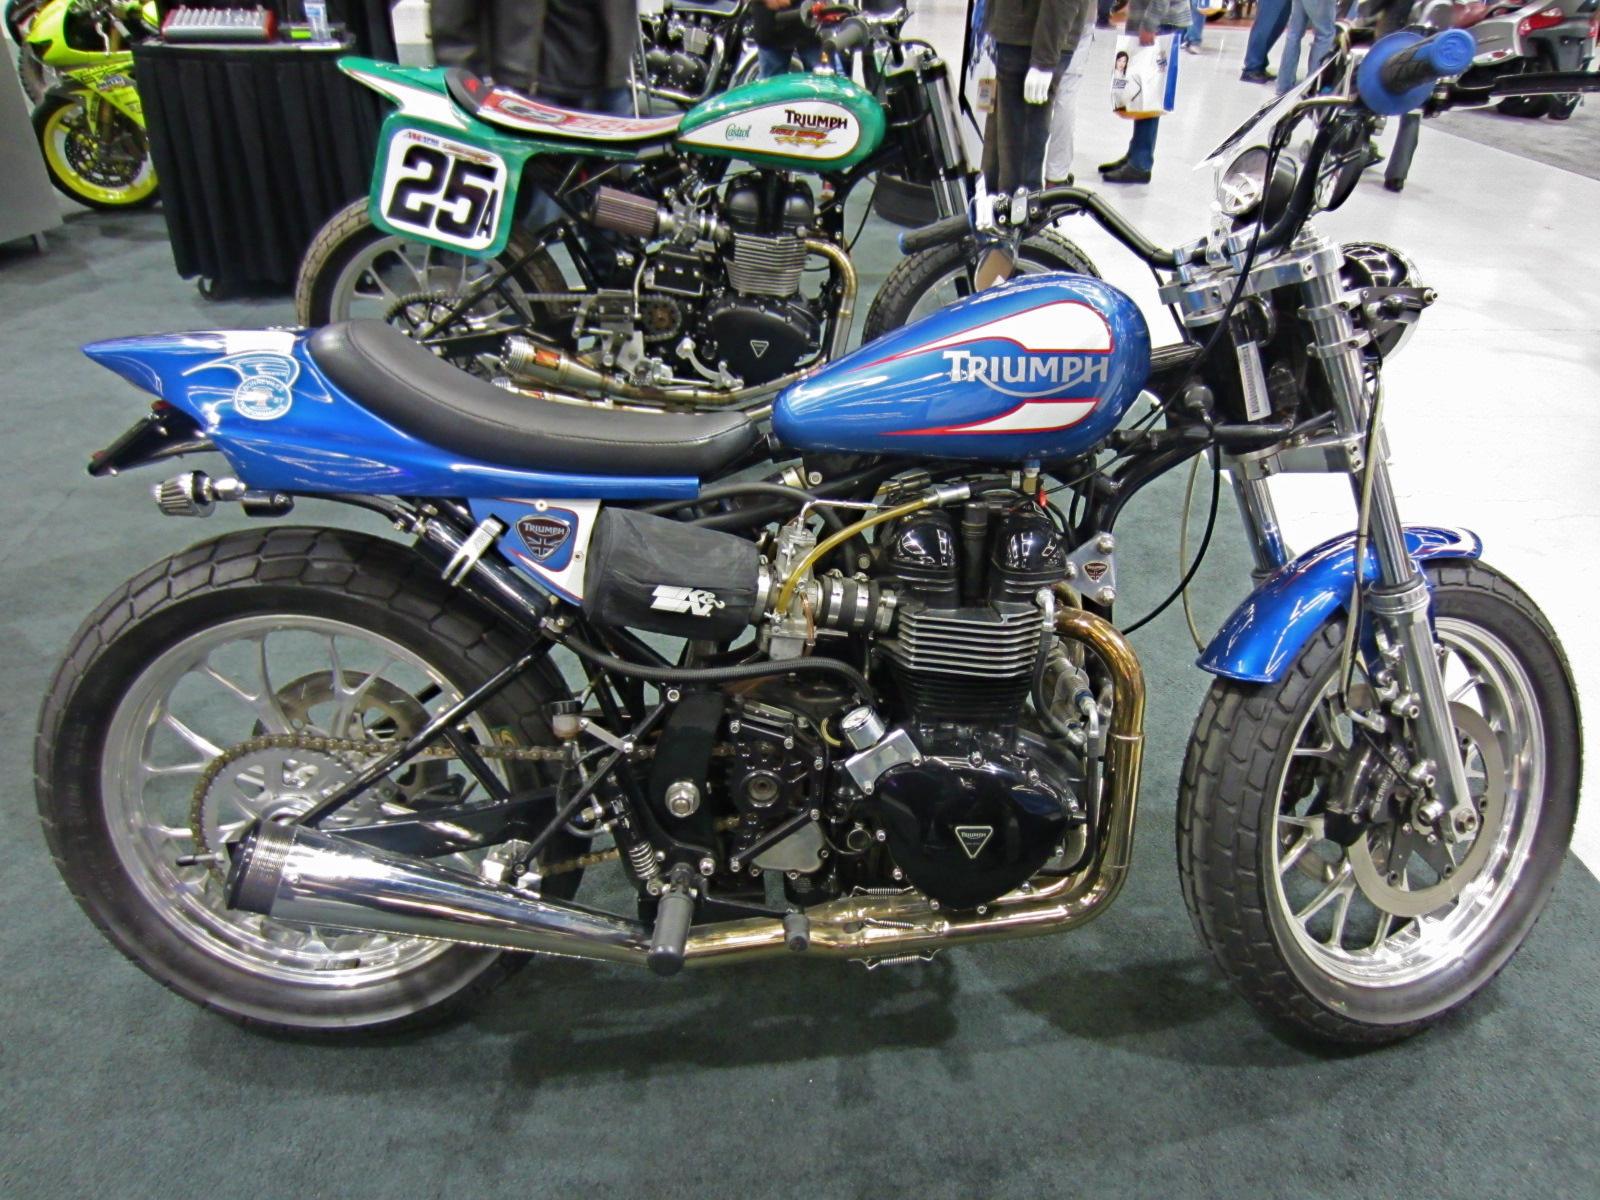 Trobairitz 39 Tablet M For Motorcycles